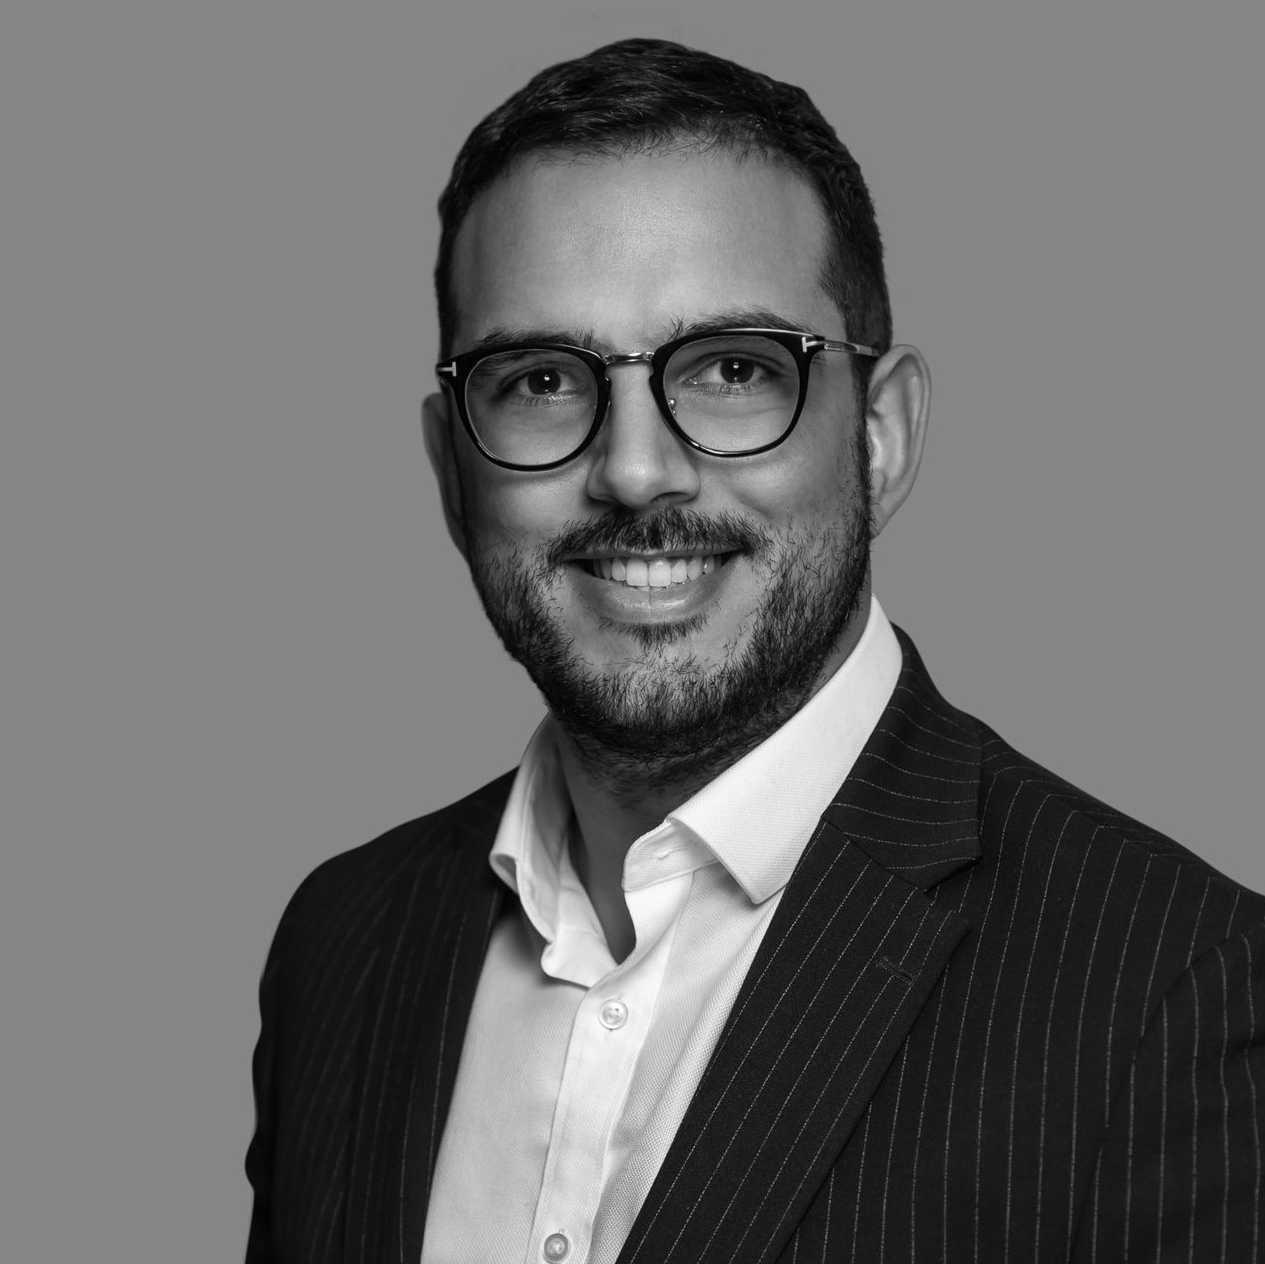 Marlin Hawk London's Consultant Michael Ioannou